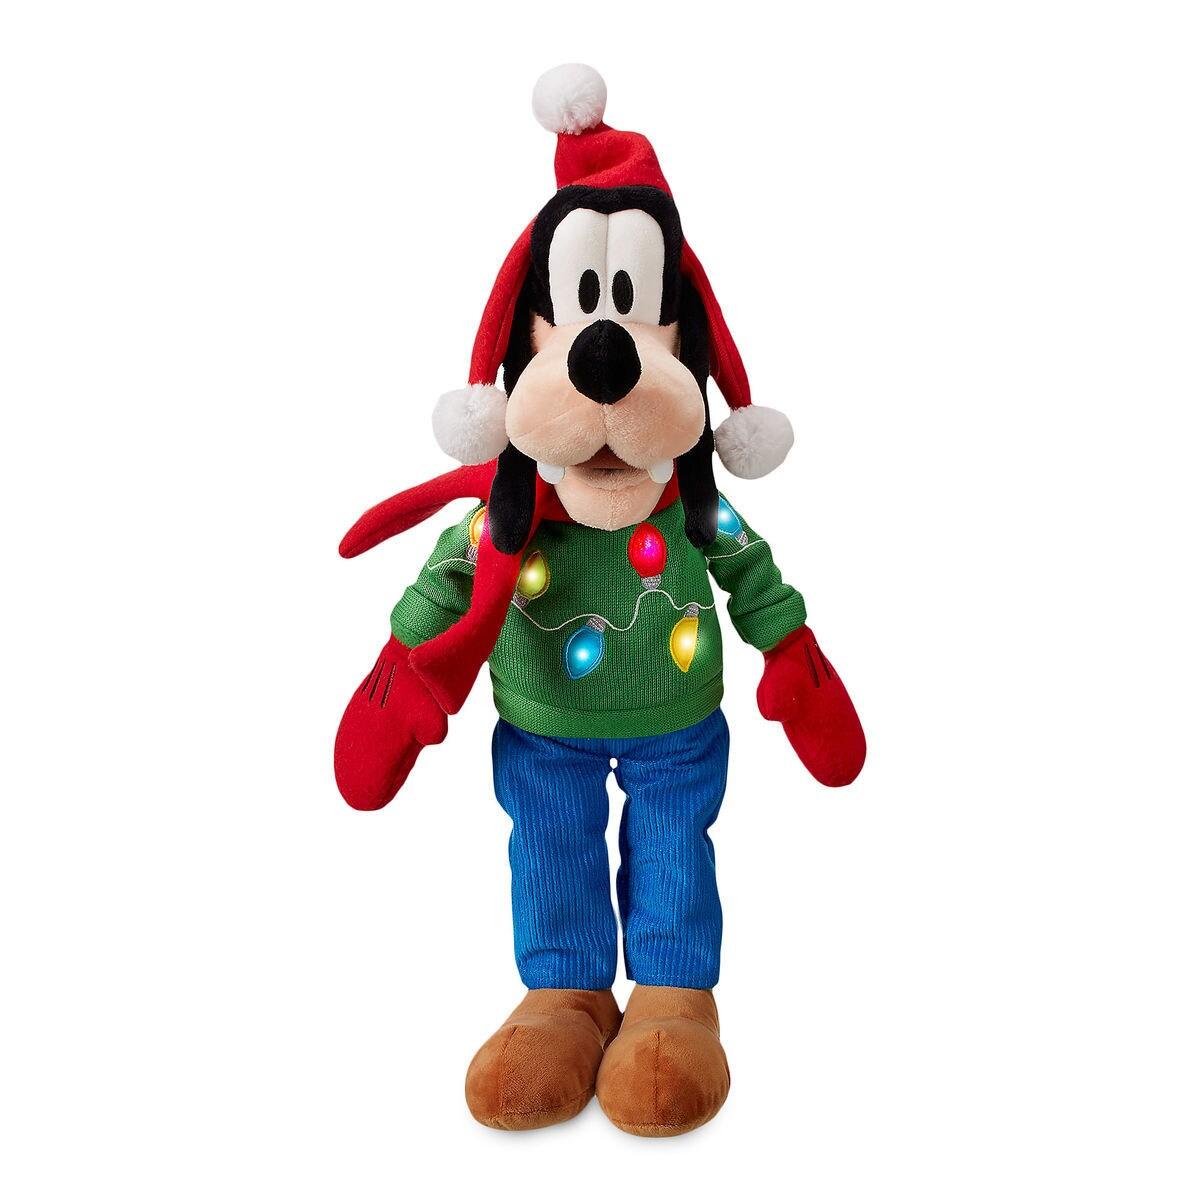 Goofy Light Up Holiday Plush Medium Shopdisney